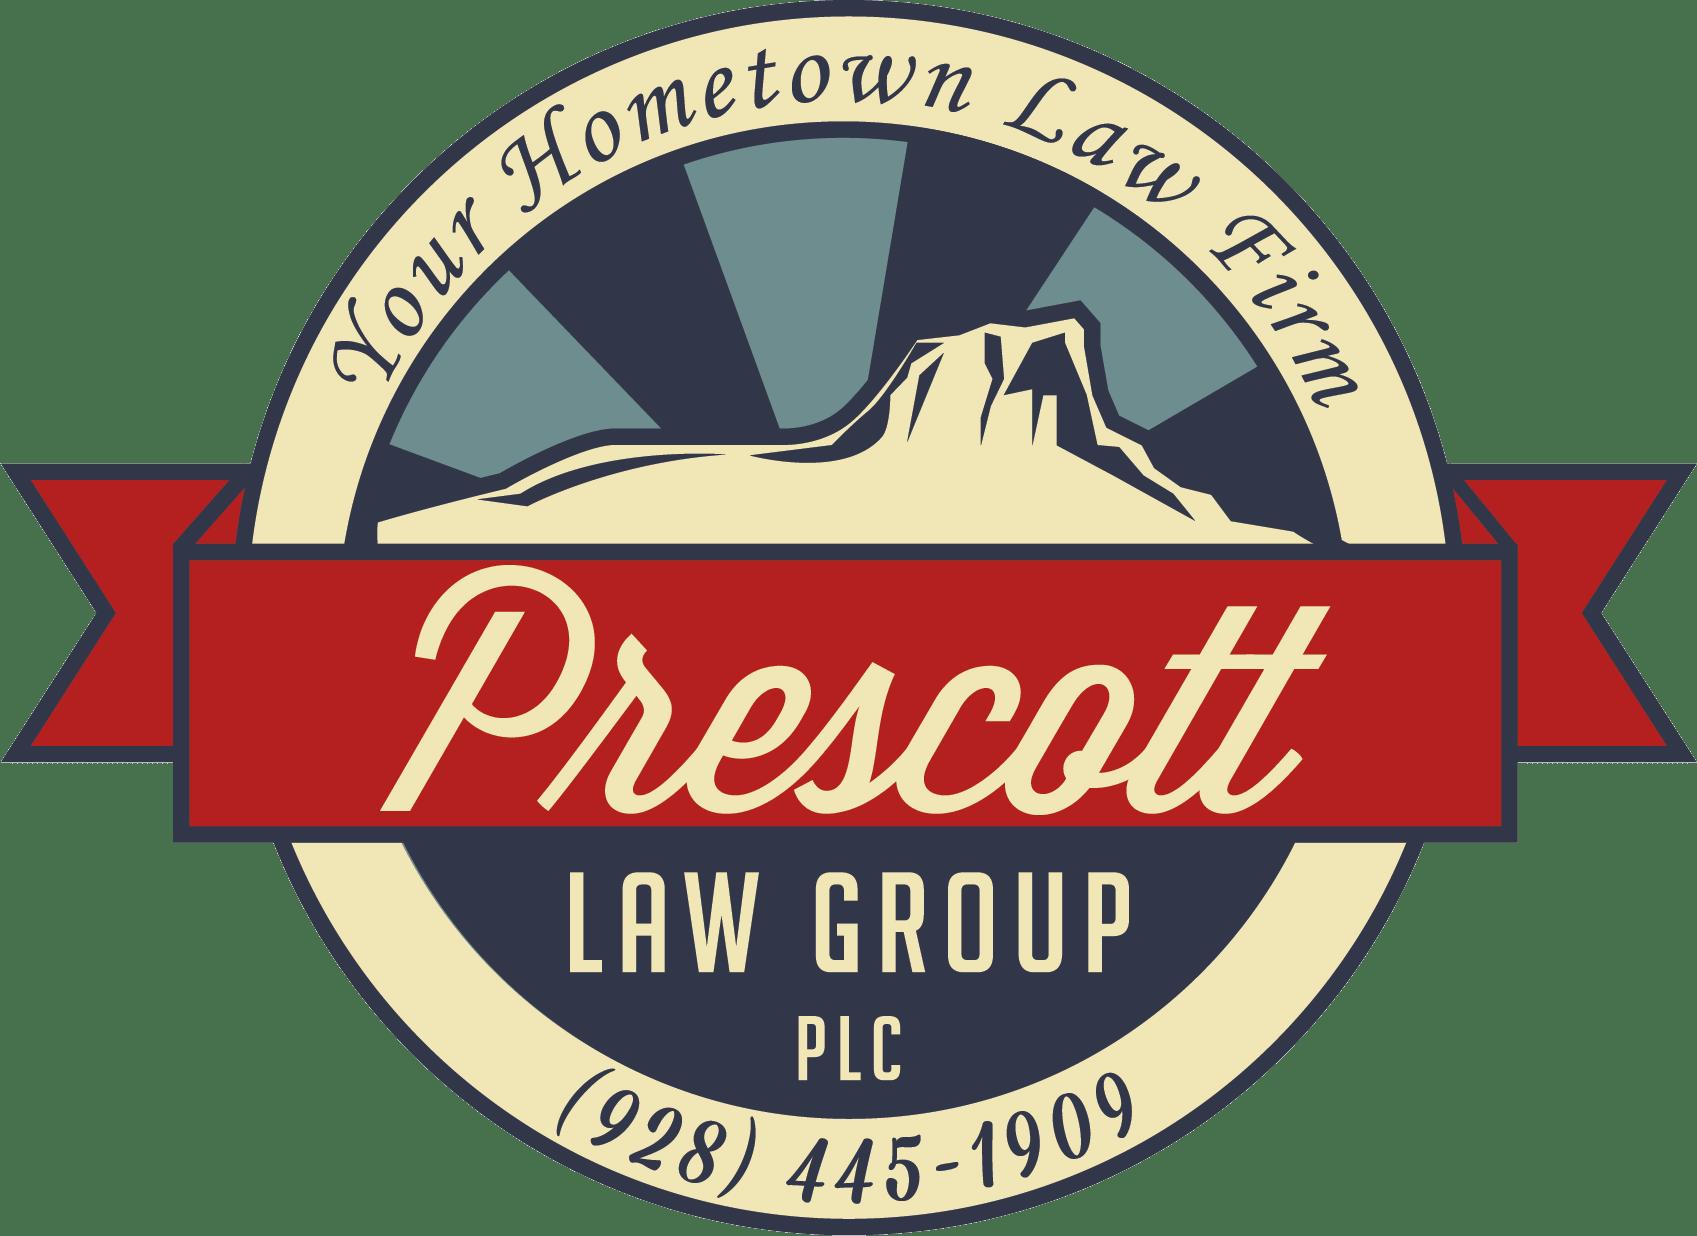 Prescott Law Group, PLC – Prescott, AZ Law Firm